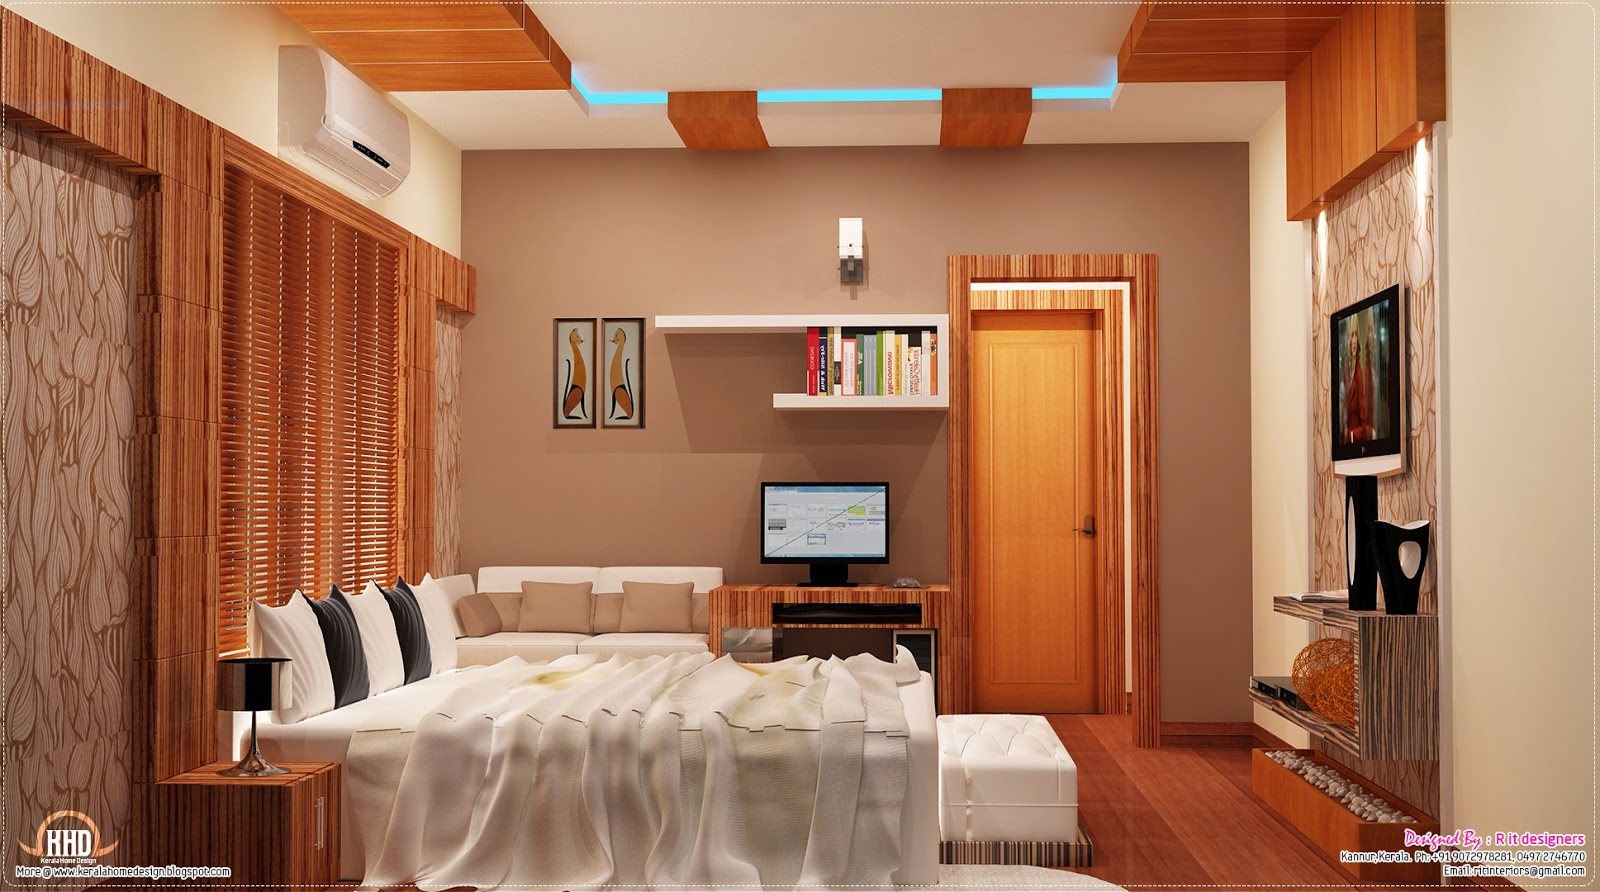 2700 Sq.feet Kerala Home With Interior Designs